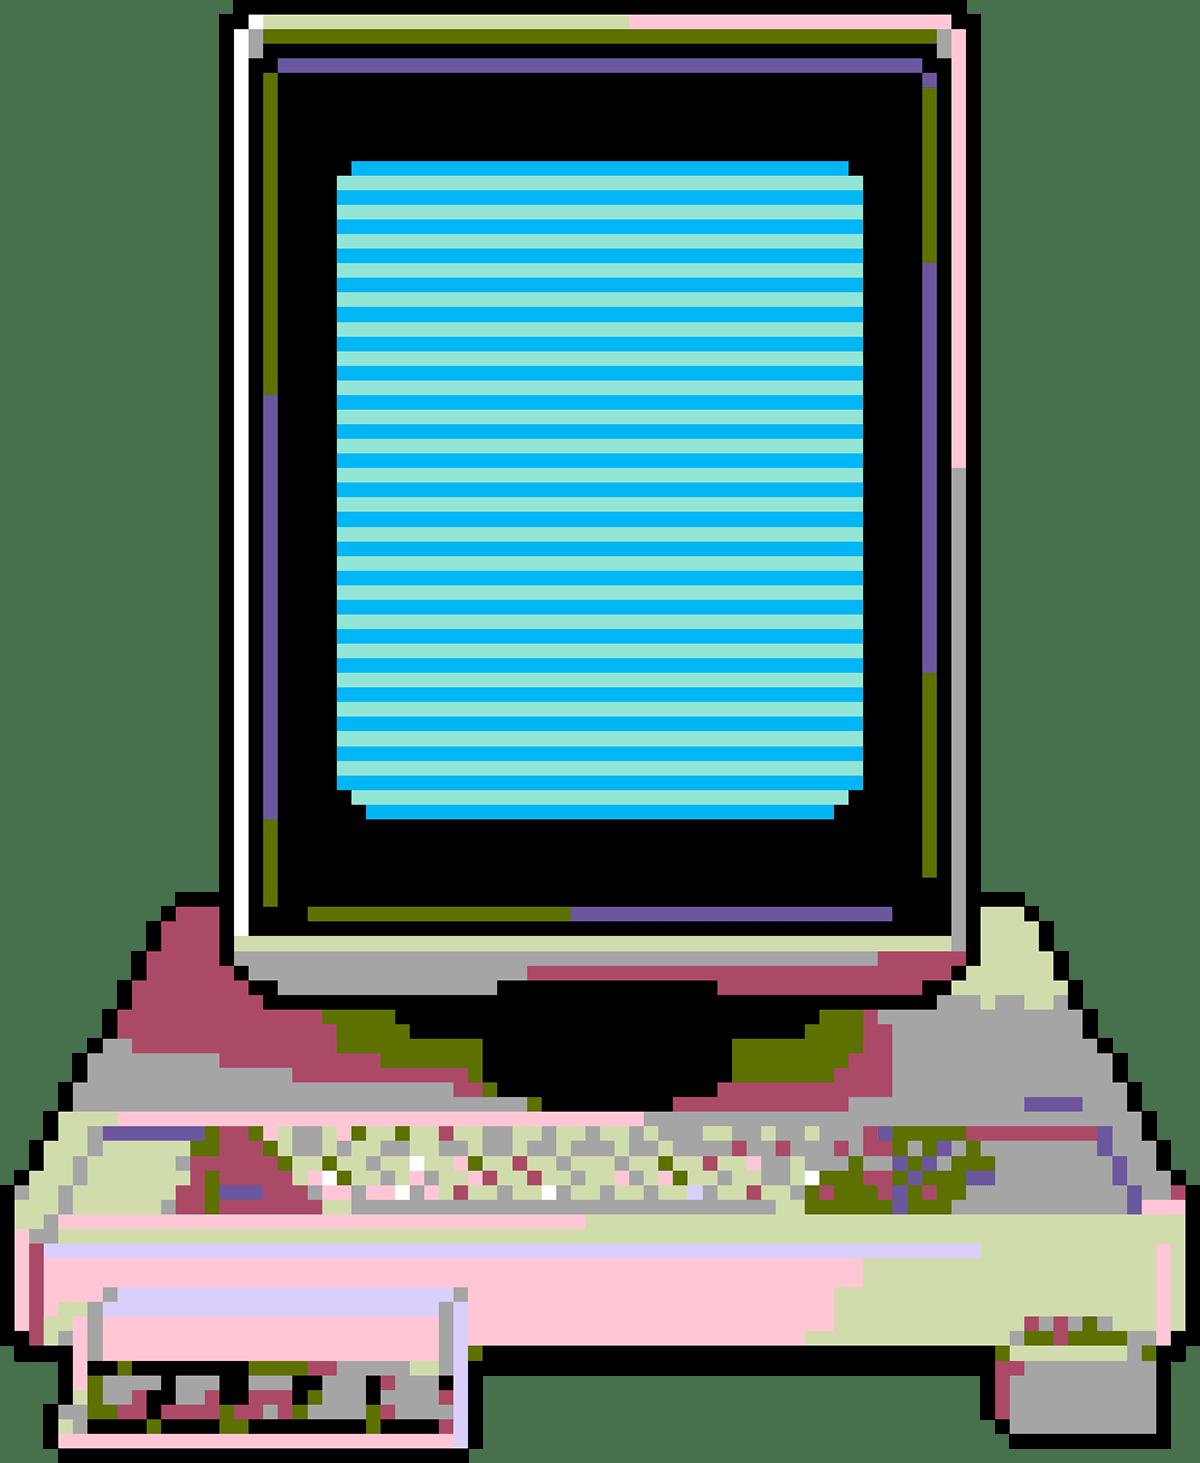 Pixel art 8bit apple